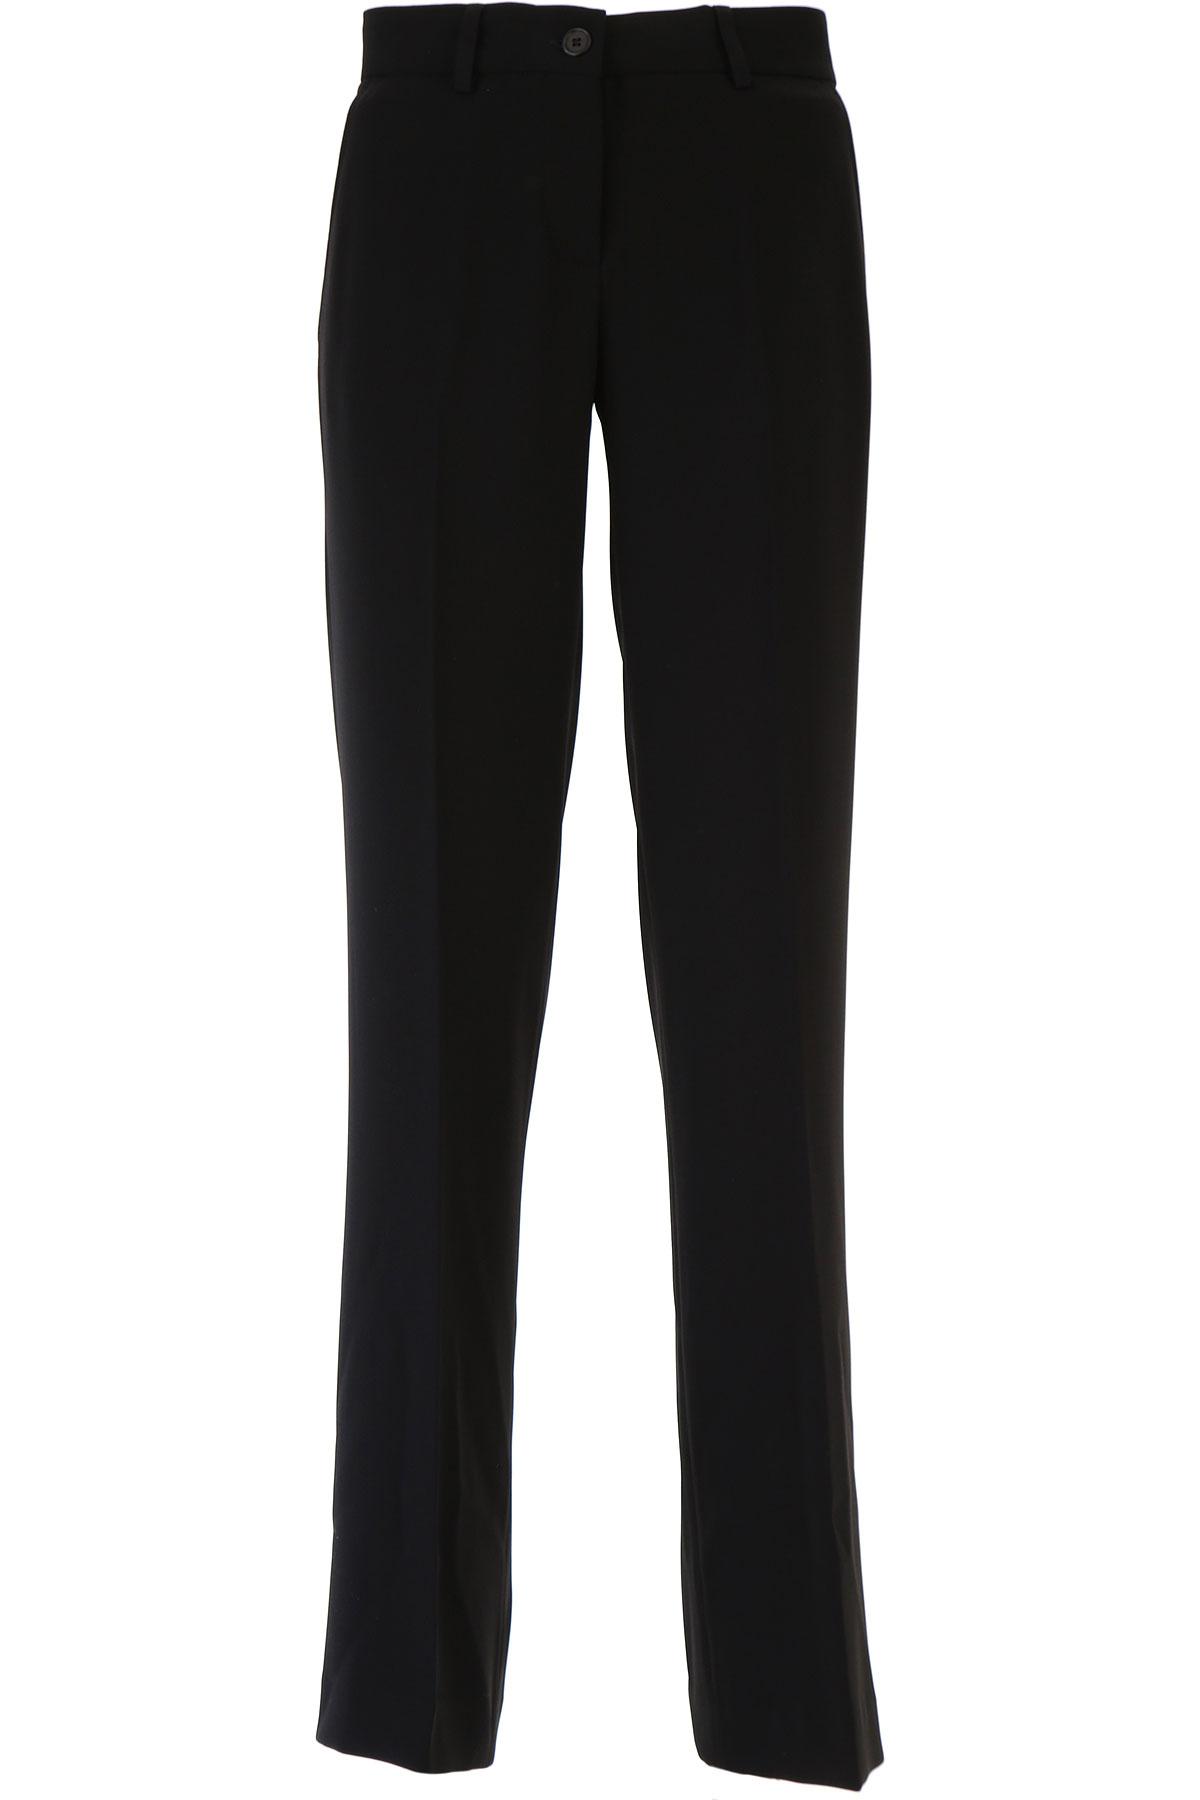 Image of Aspesi Pants for Women, Black, Triacetate, 2017, 26 28 30 32